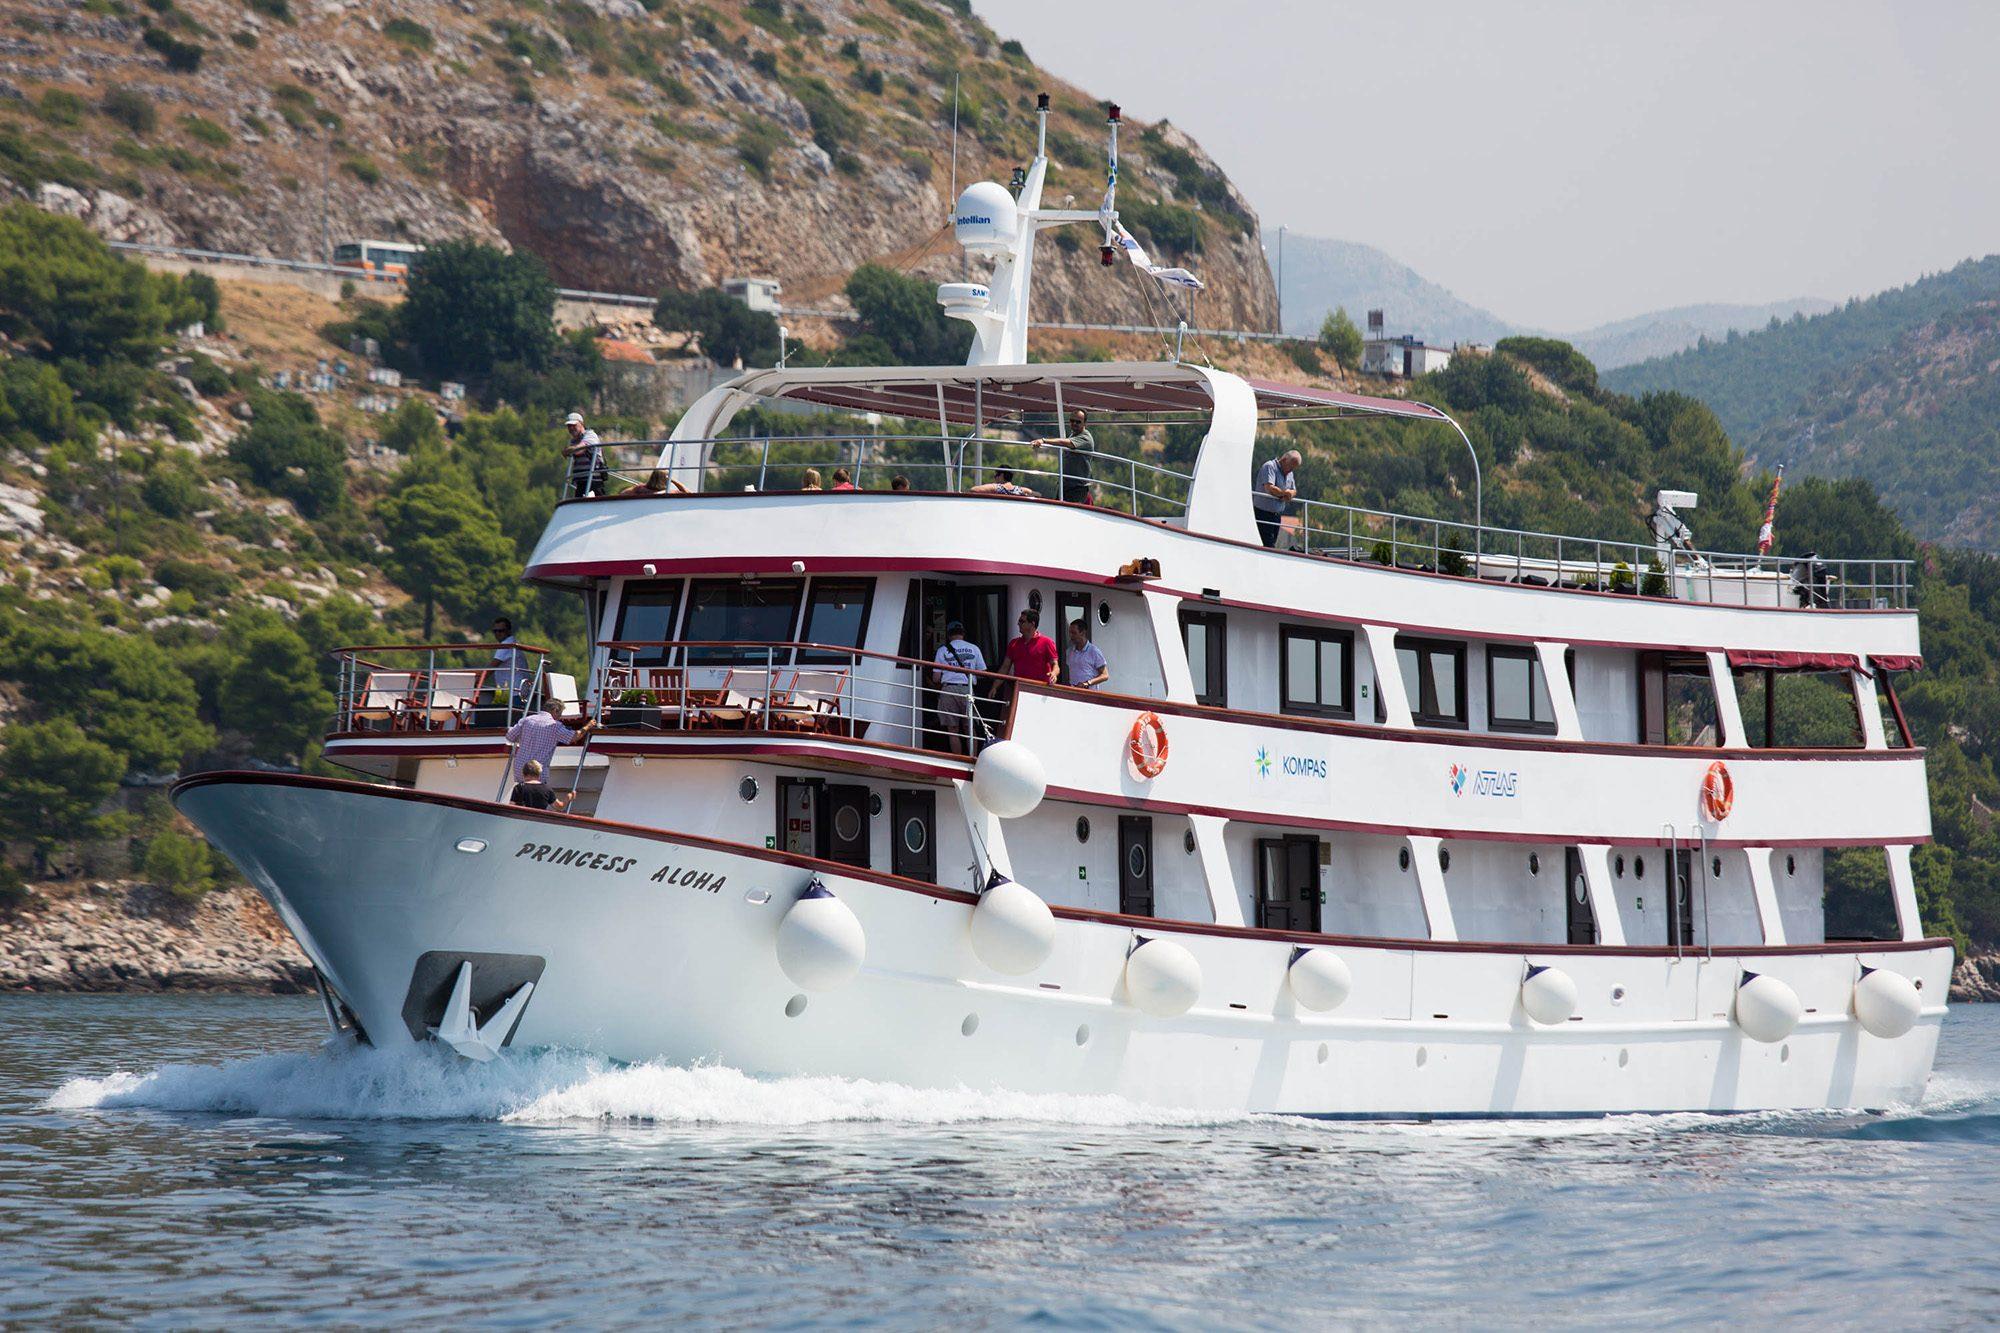 princess aloha cruise ship croatia 0